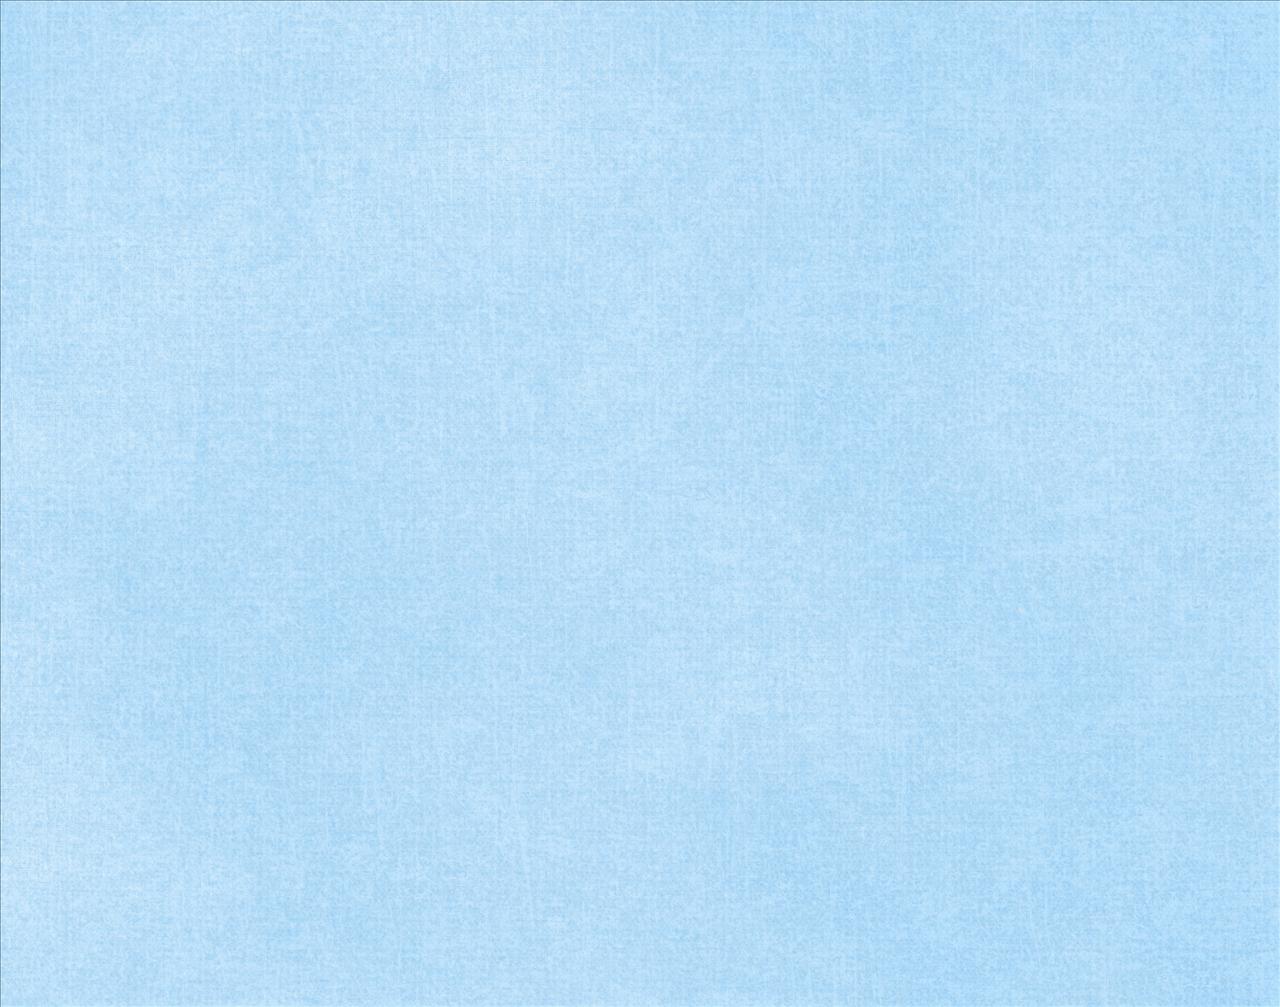 light blue background 1280x1007